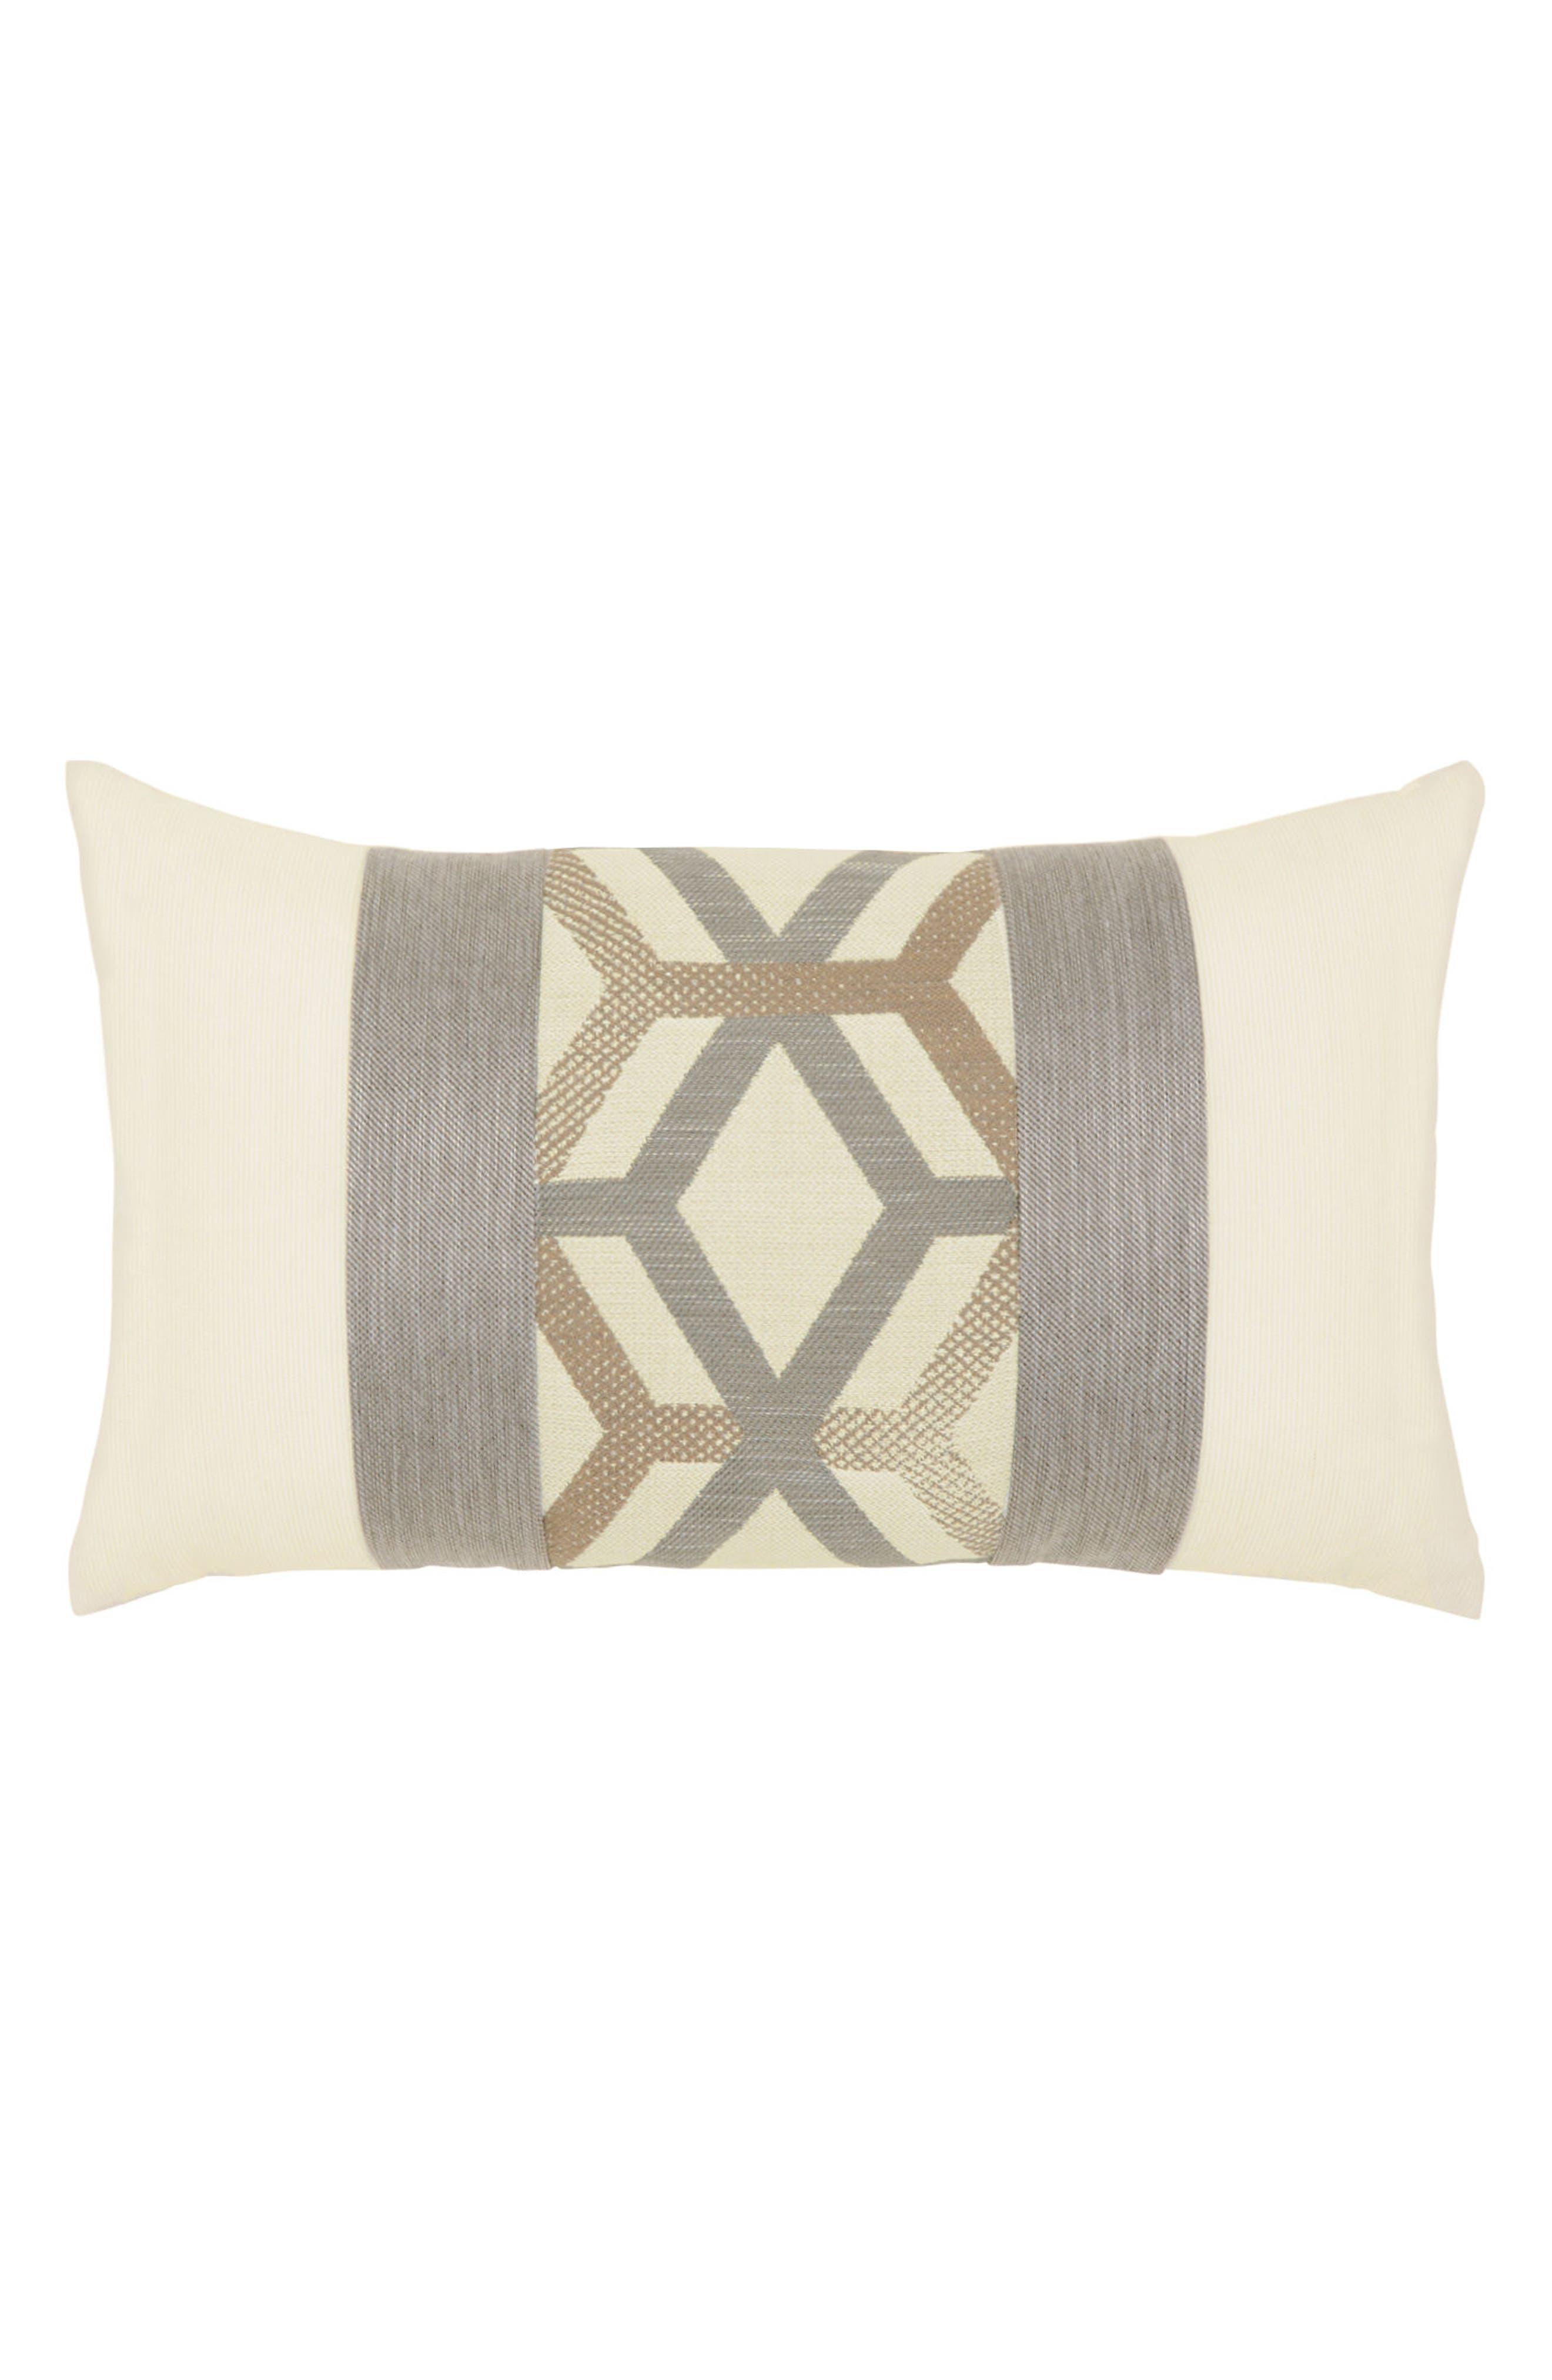 Lustrous Lines Lumbar Pillow,                             Main thumbnail 1, color,                             IVORY/ GREY